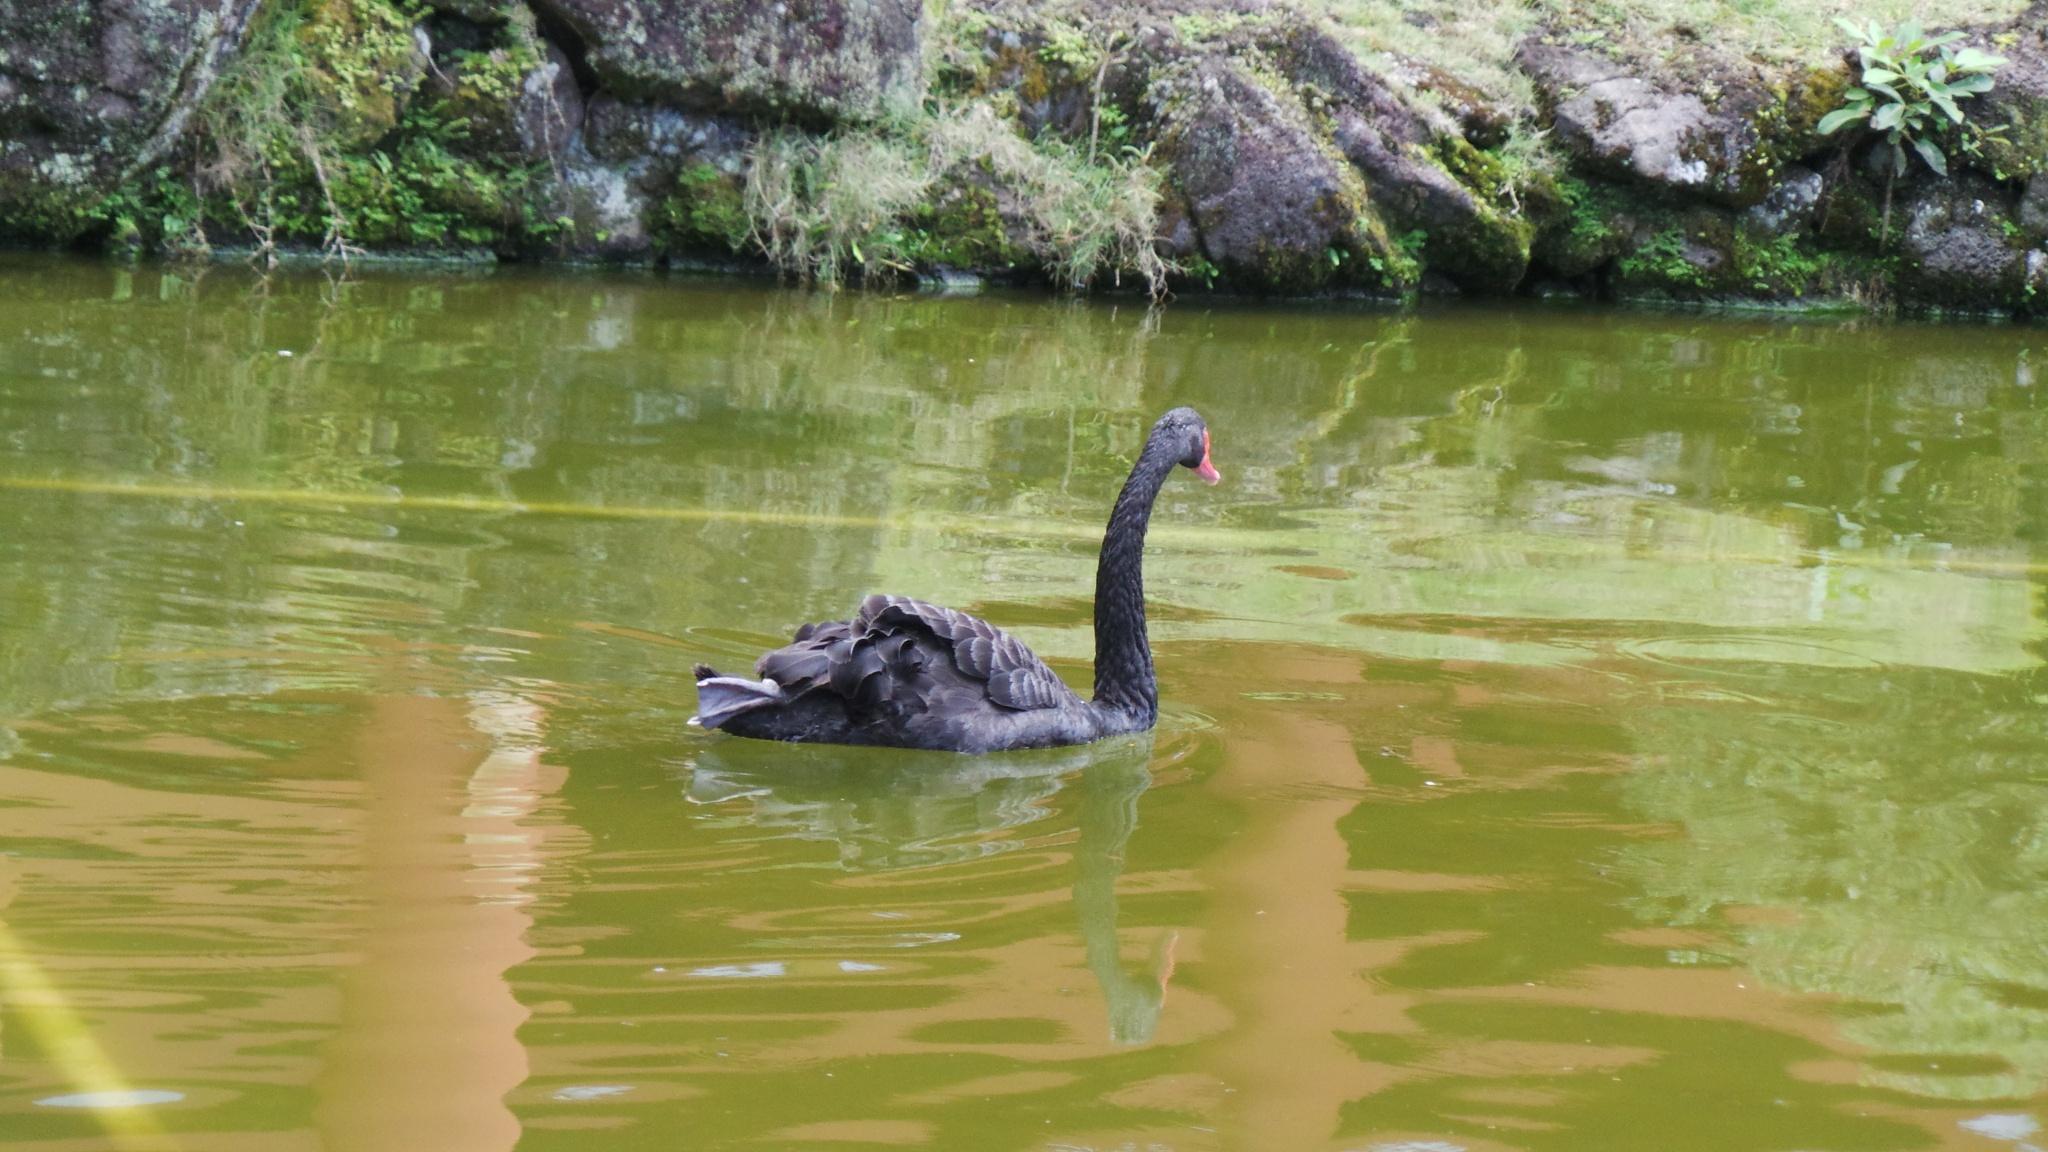 swimming bird by Shabana